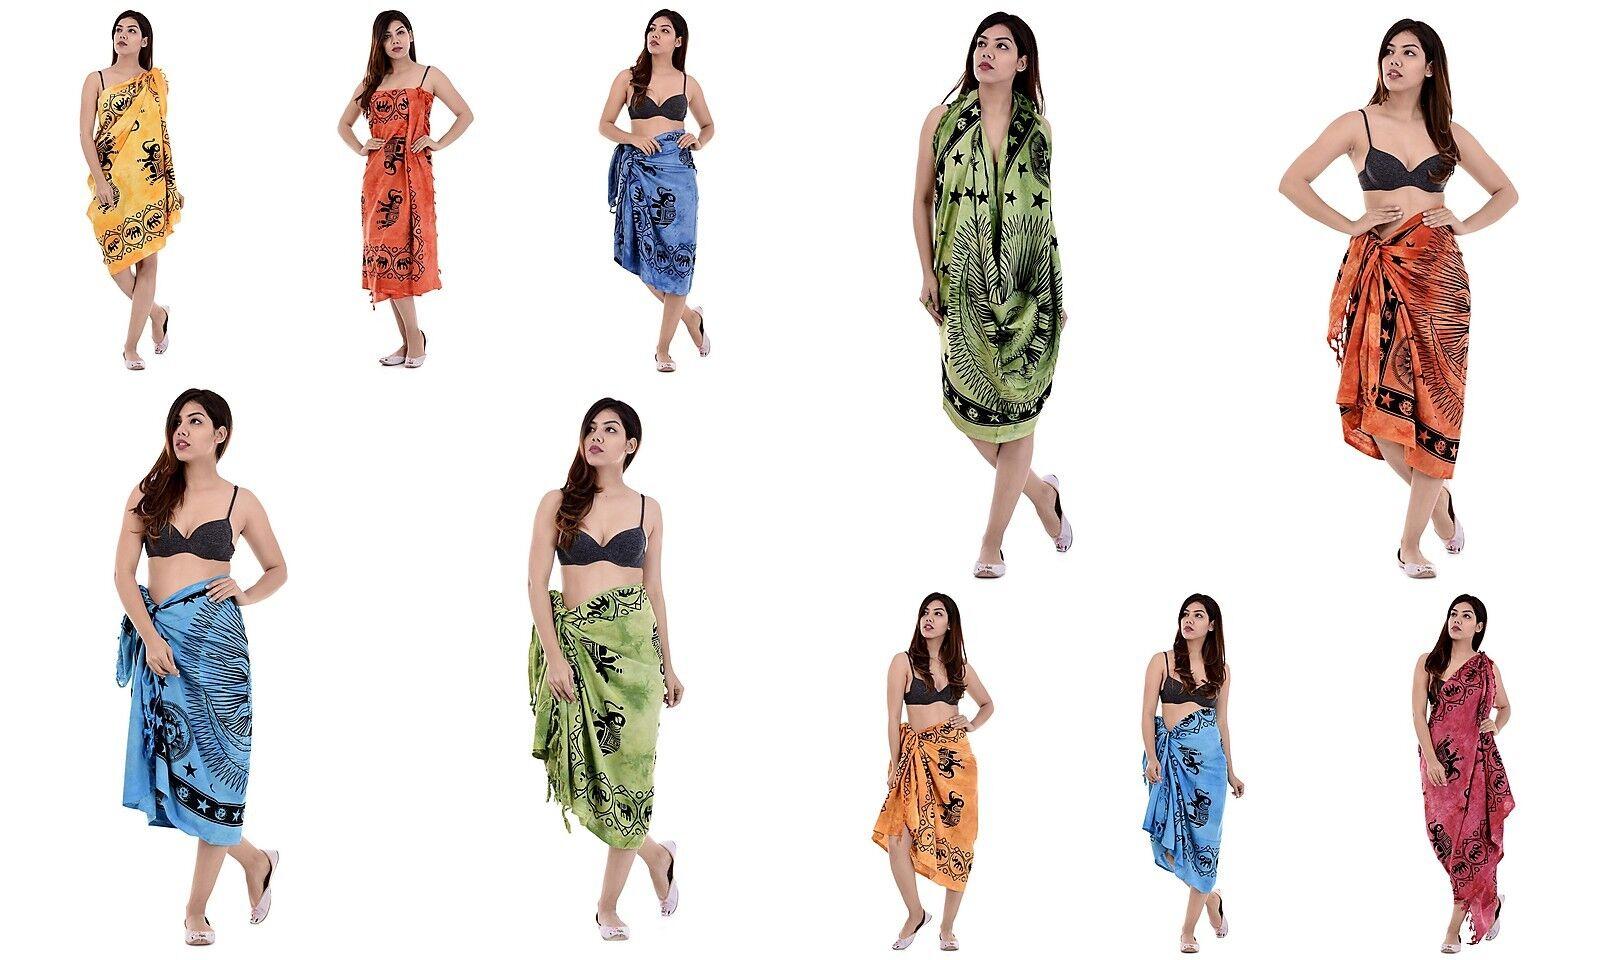 5 PC Wholesale Lot Mandala Beach Cover Up Kaftan Sarong Summer Indian Pareo Boho